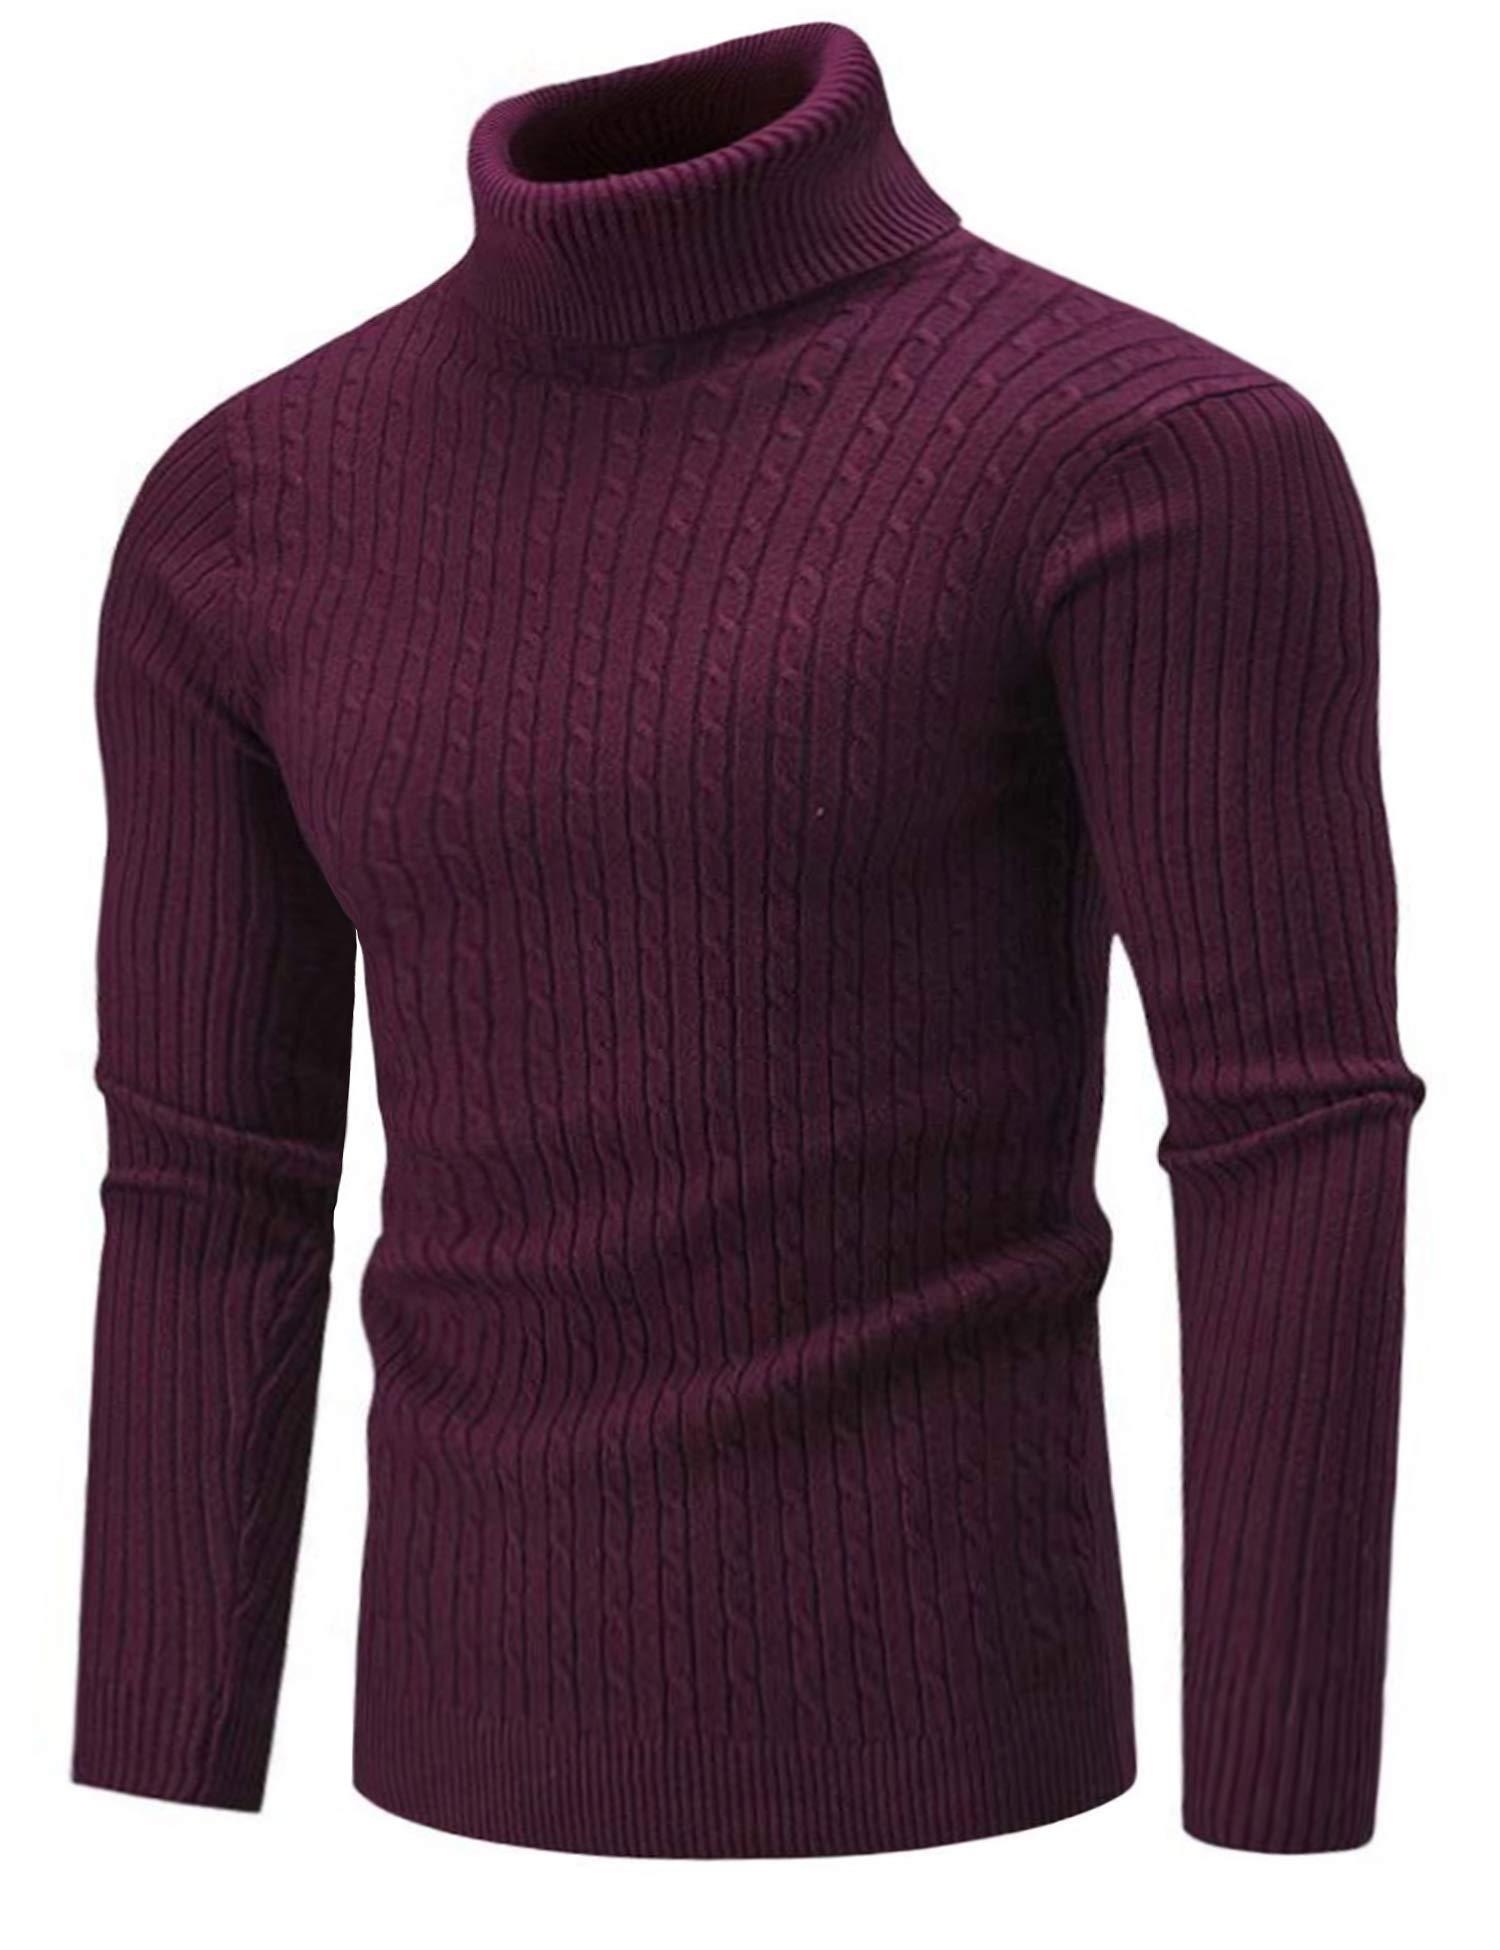 Goodthreads Mens Supersoft Marled Turtleneck Sweater